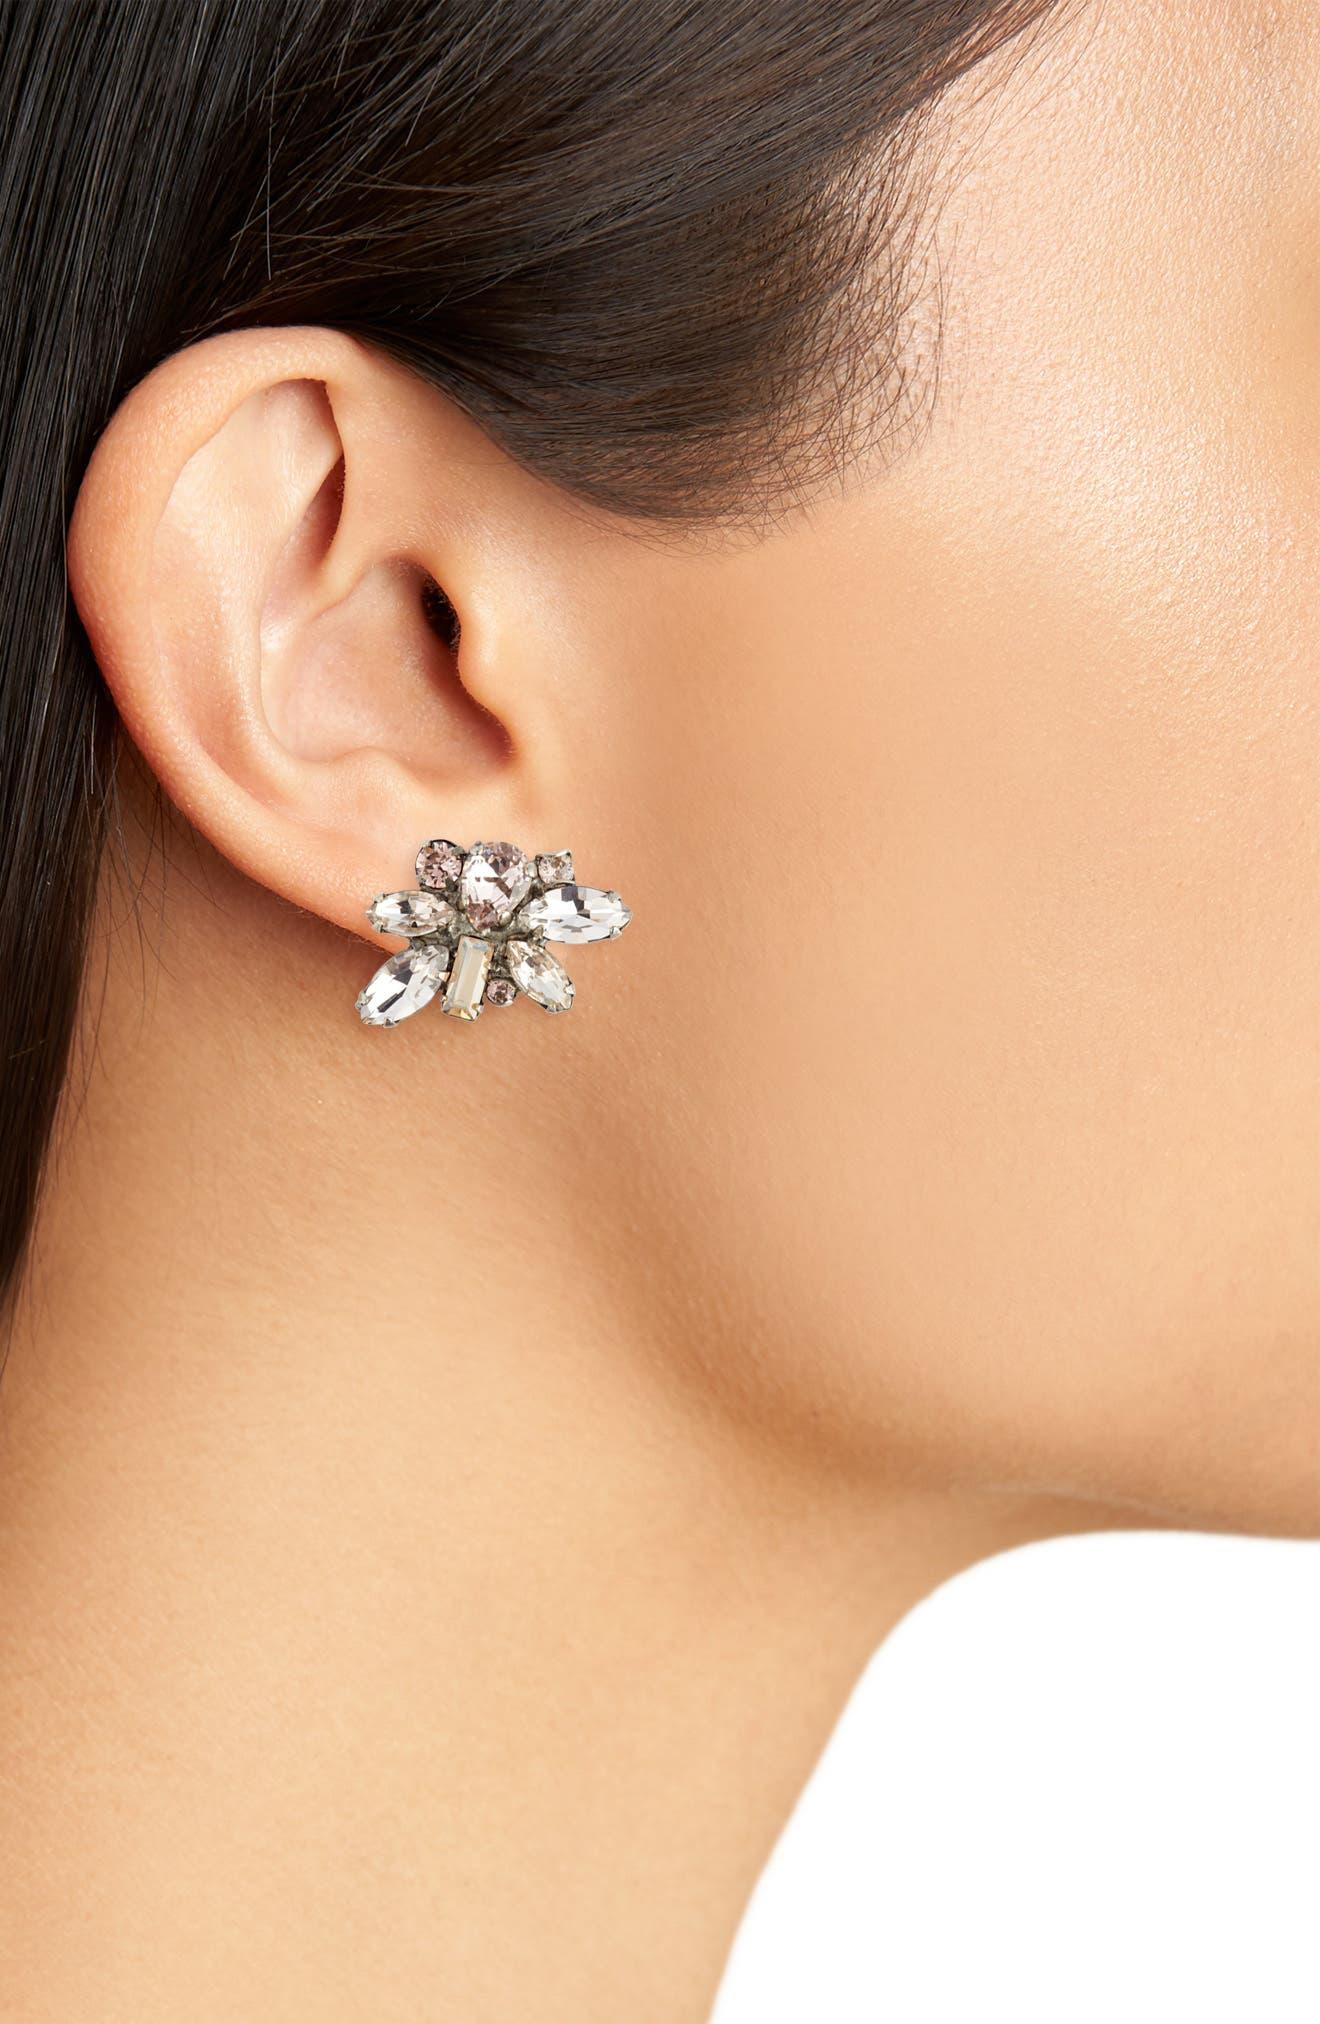 Muscari Crystal Earrings,                             Alternate thumbnail 2, color,                             Pink